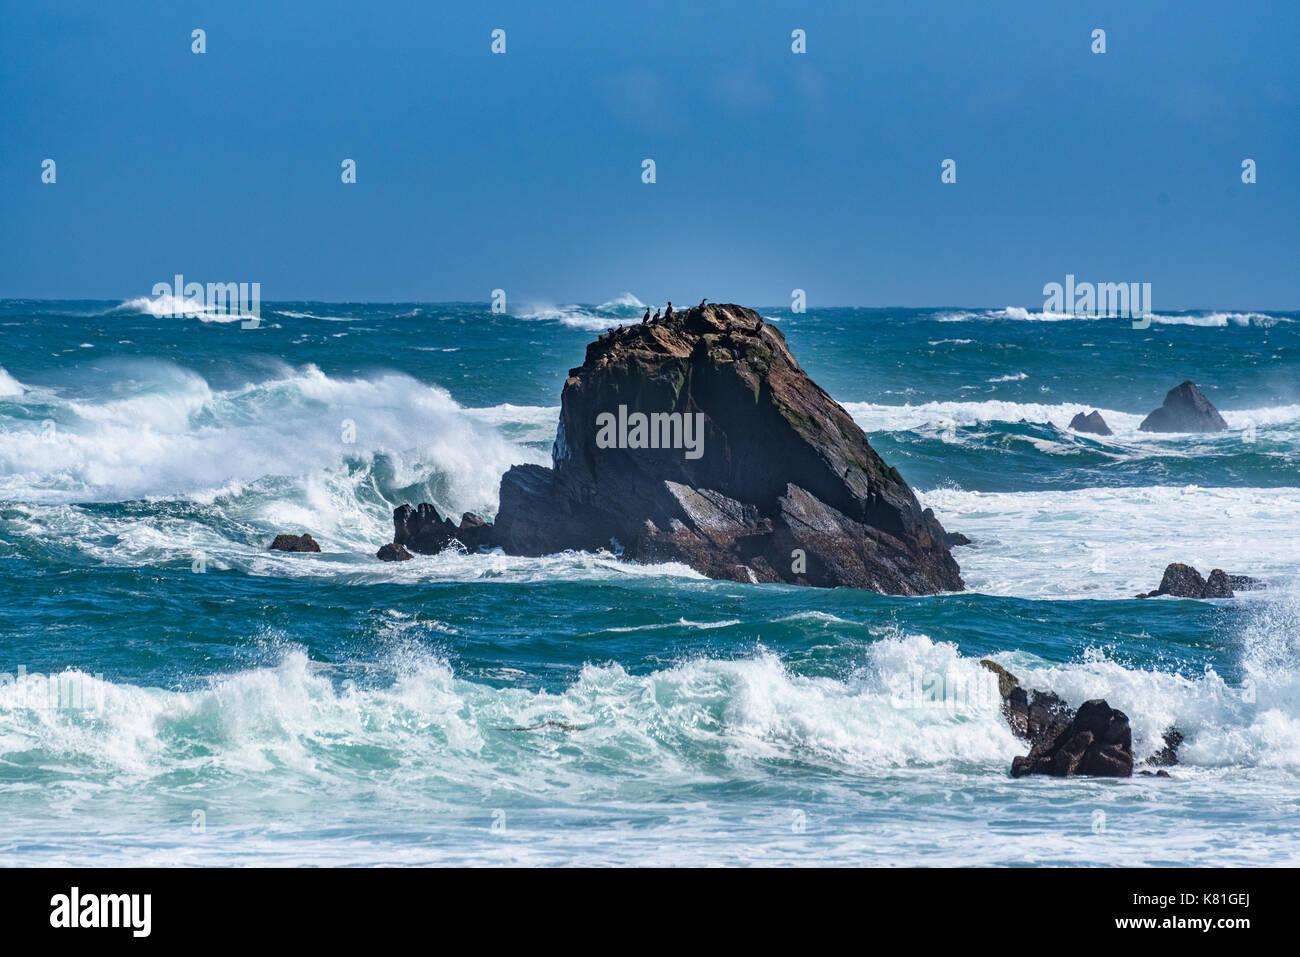 Waves crash against the rocks along the Alaskan Coast - Stock Image